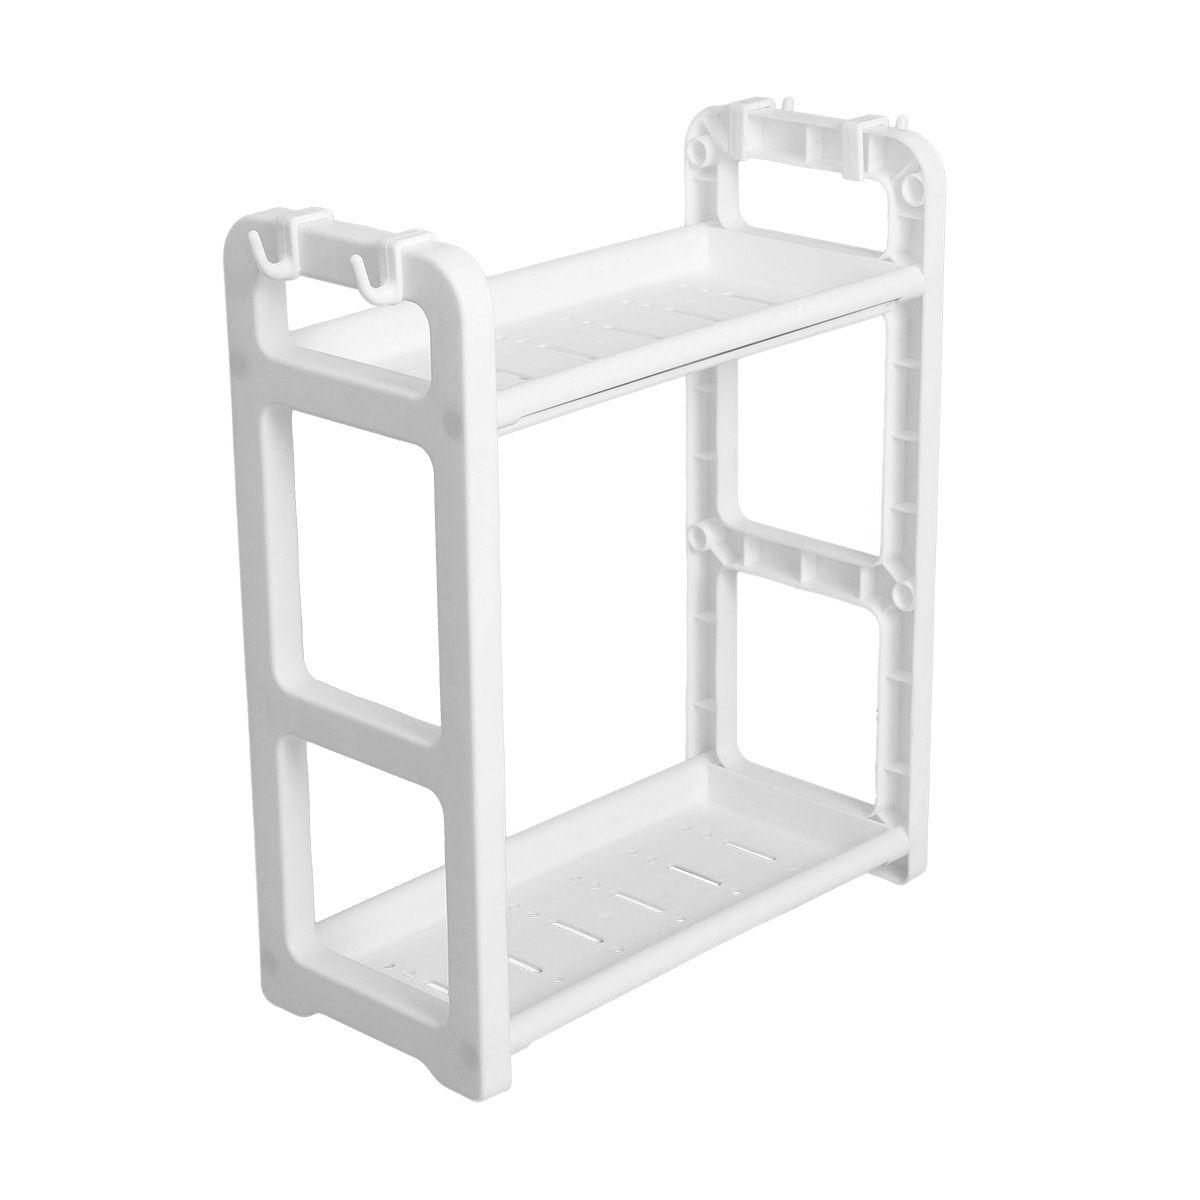 2 Tier Table Standing Rack Kitchen Bathroom Shelf Countertop Bathroom Organizer Tier Shelf Storage In 2020 Countertop Storage Bathroom Shelves Kitchens Bathrooms